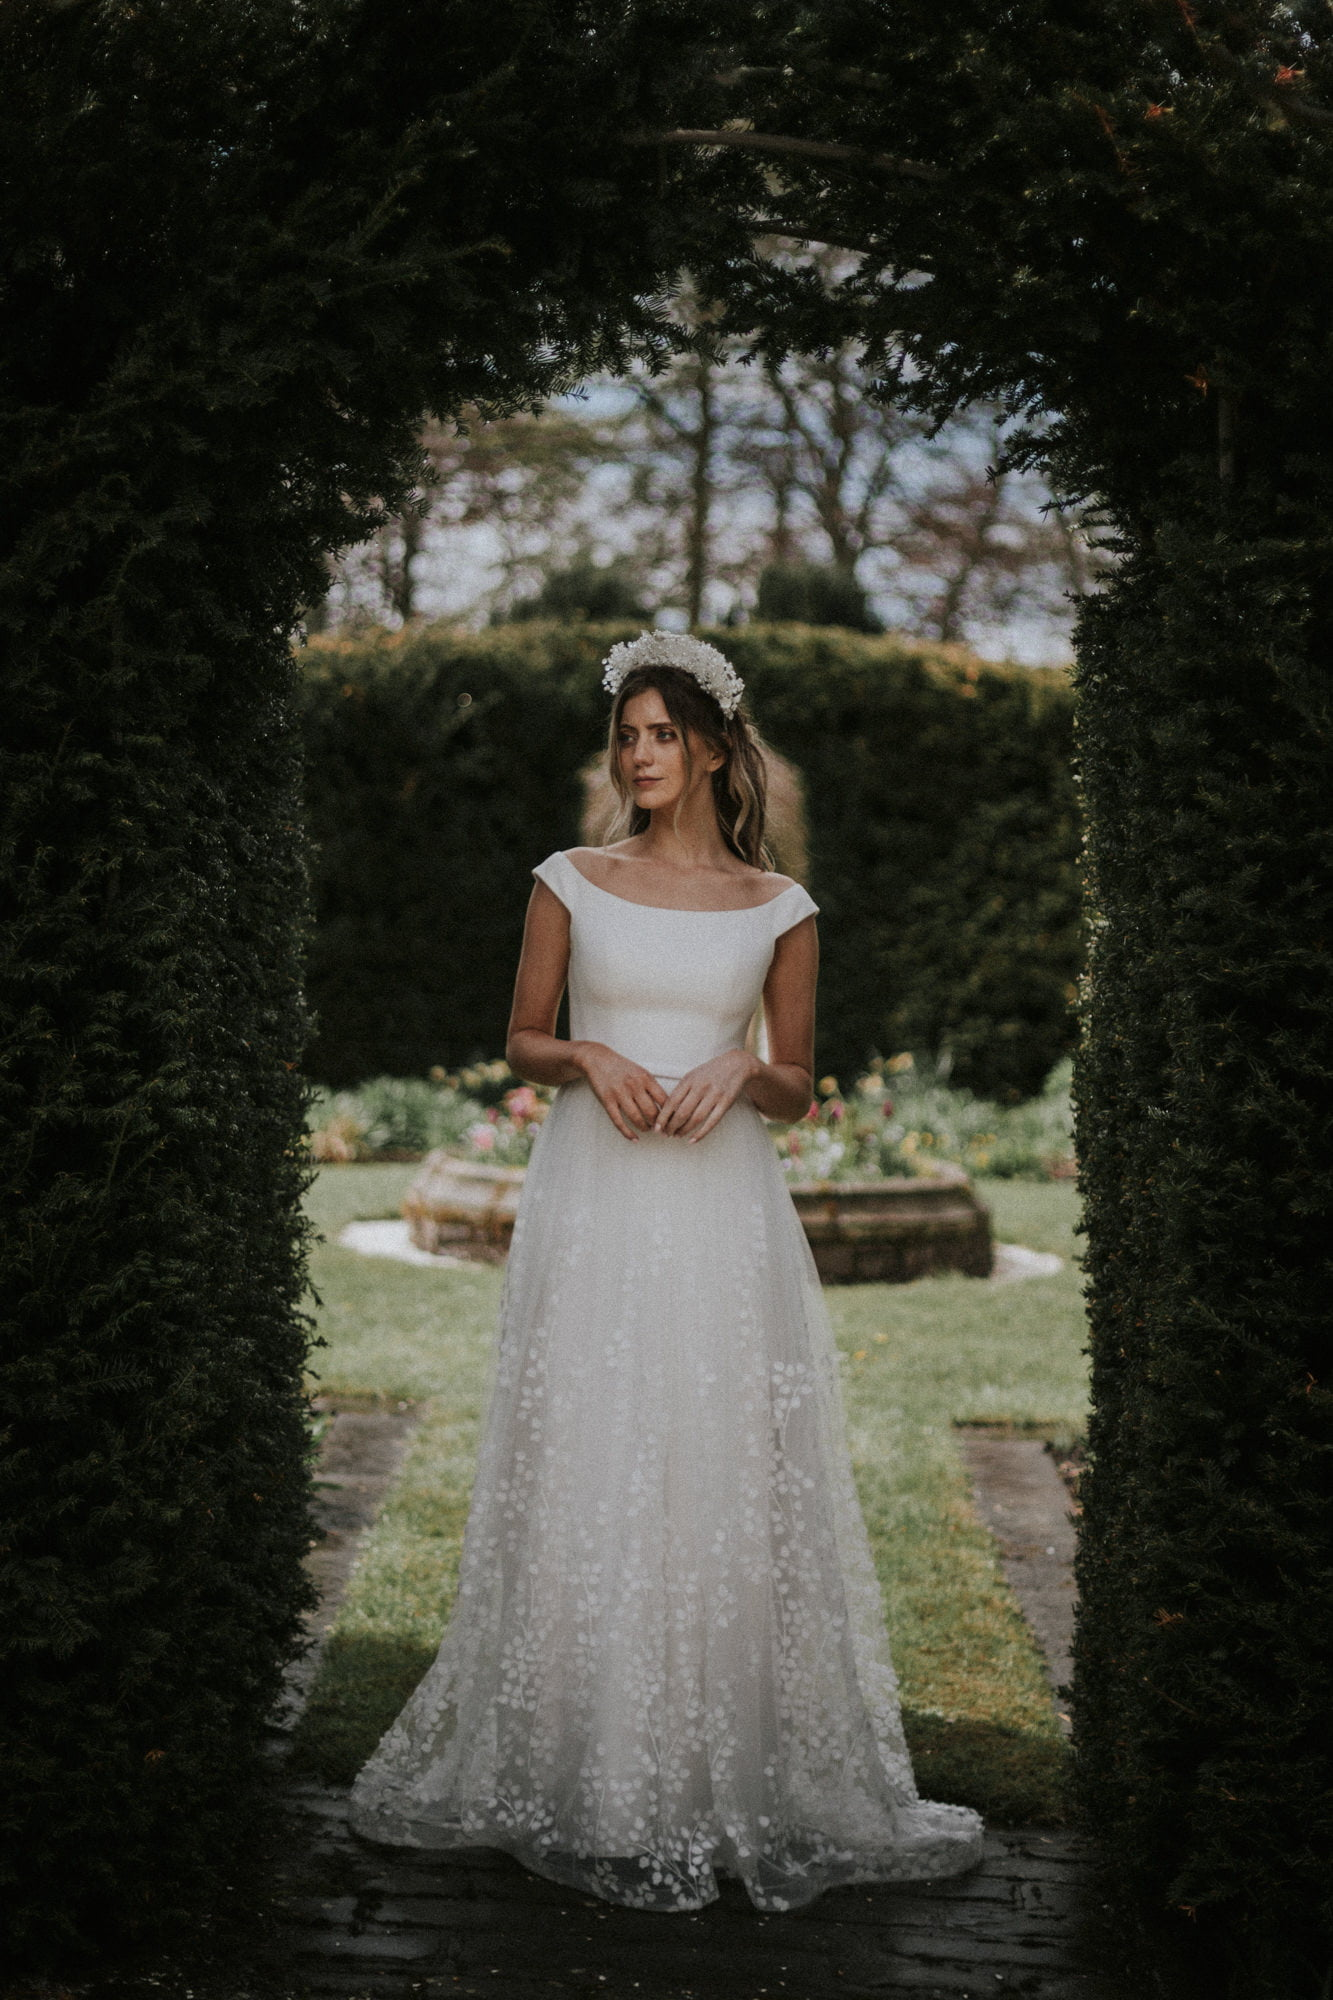 Oscar Lili - Beautiful Boho Wedding Dresses, Backhouse Rossie Estate Wedding Venue, Backhouse Rossie Wedding Venue Fife